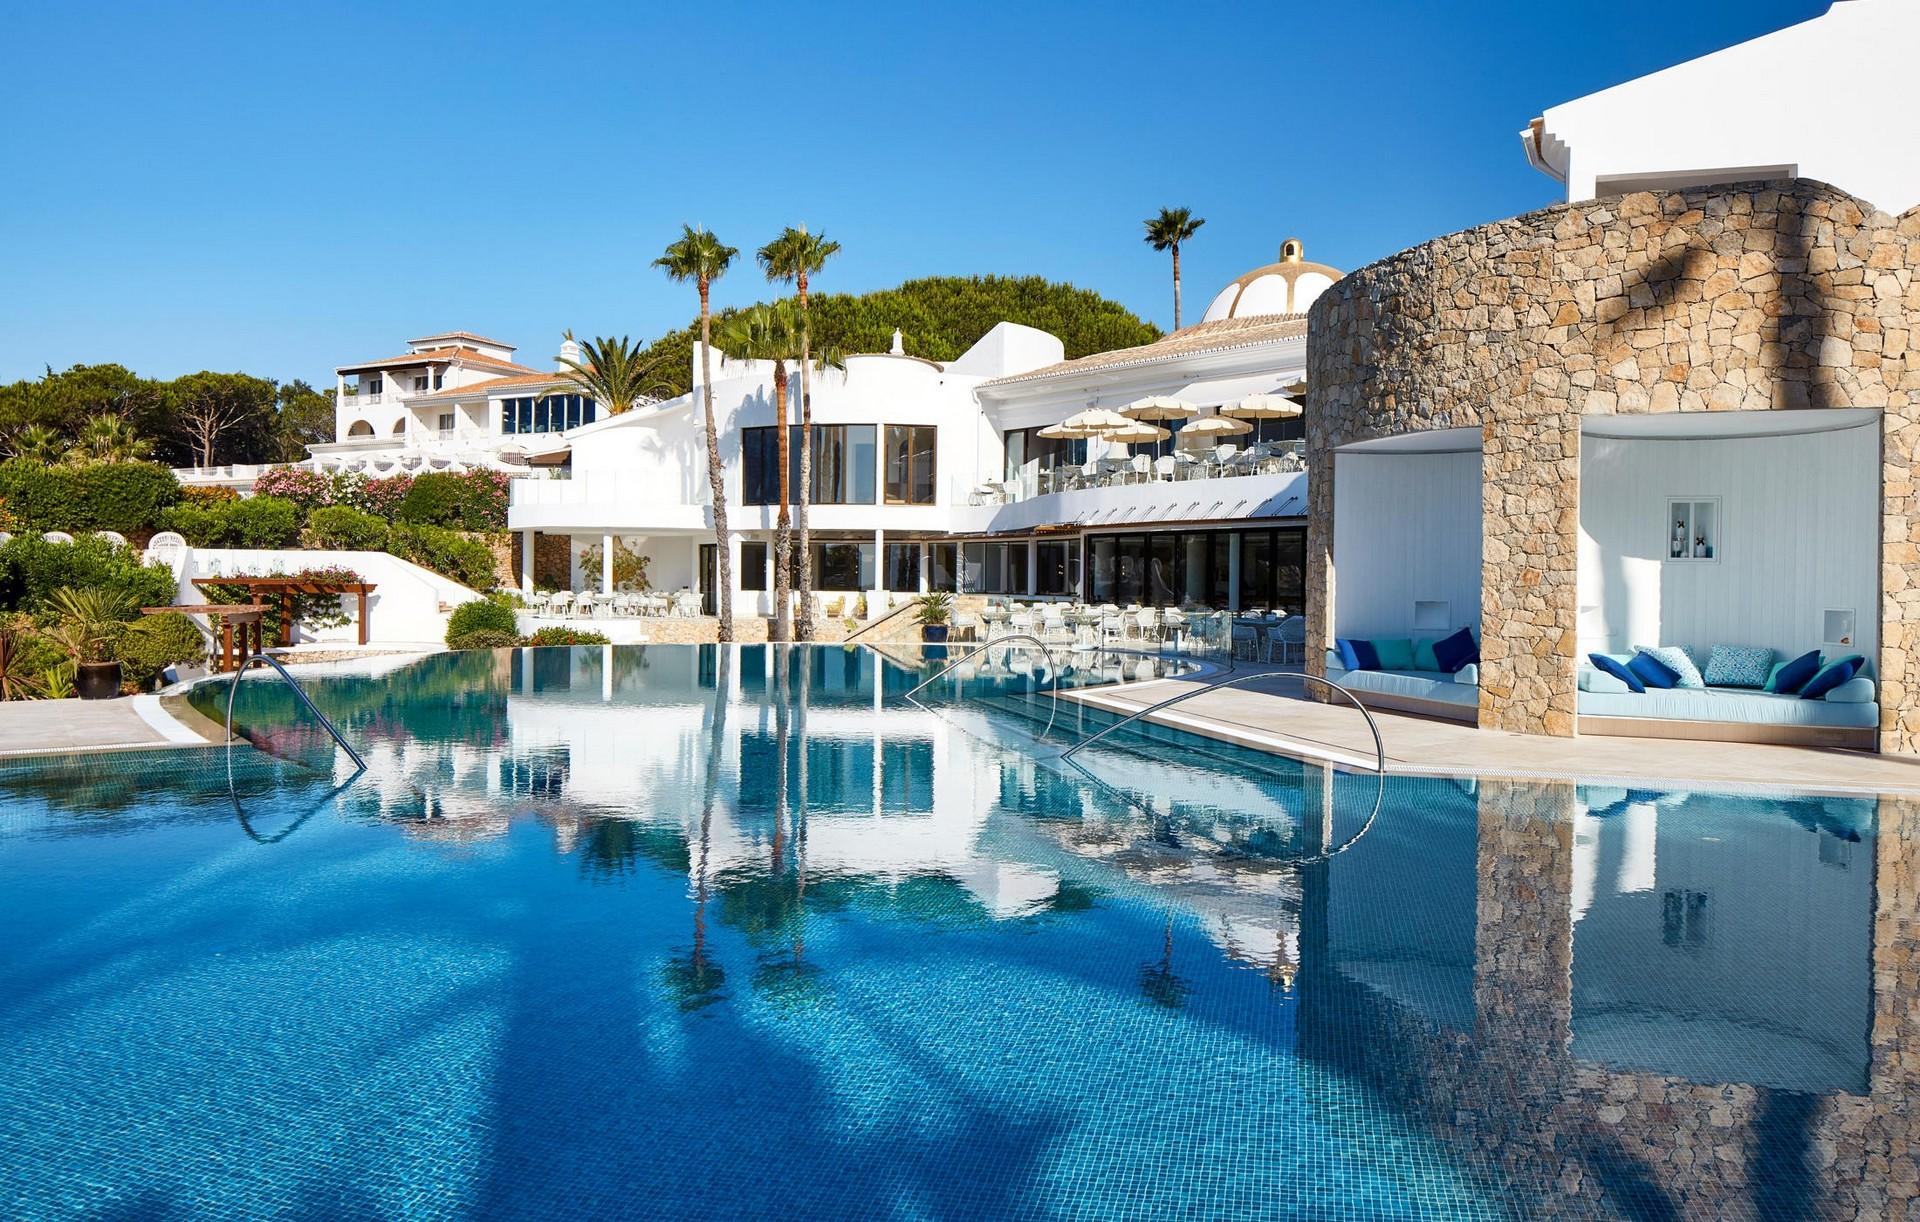 Vila Vita Parc 5 vila vita parc Vila Vita Parc: Get a behind the scenes look of a luxury hotel Vila Vita Parc 5